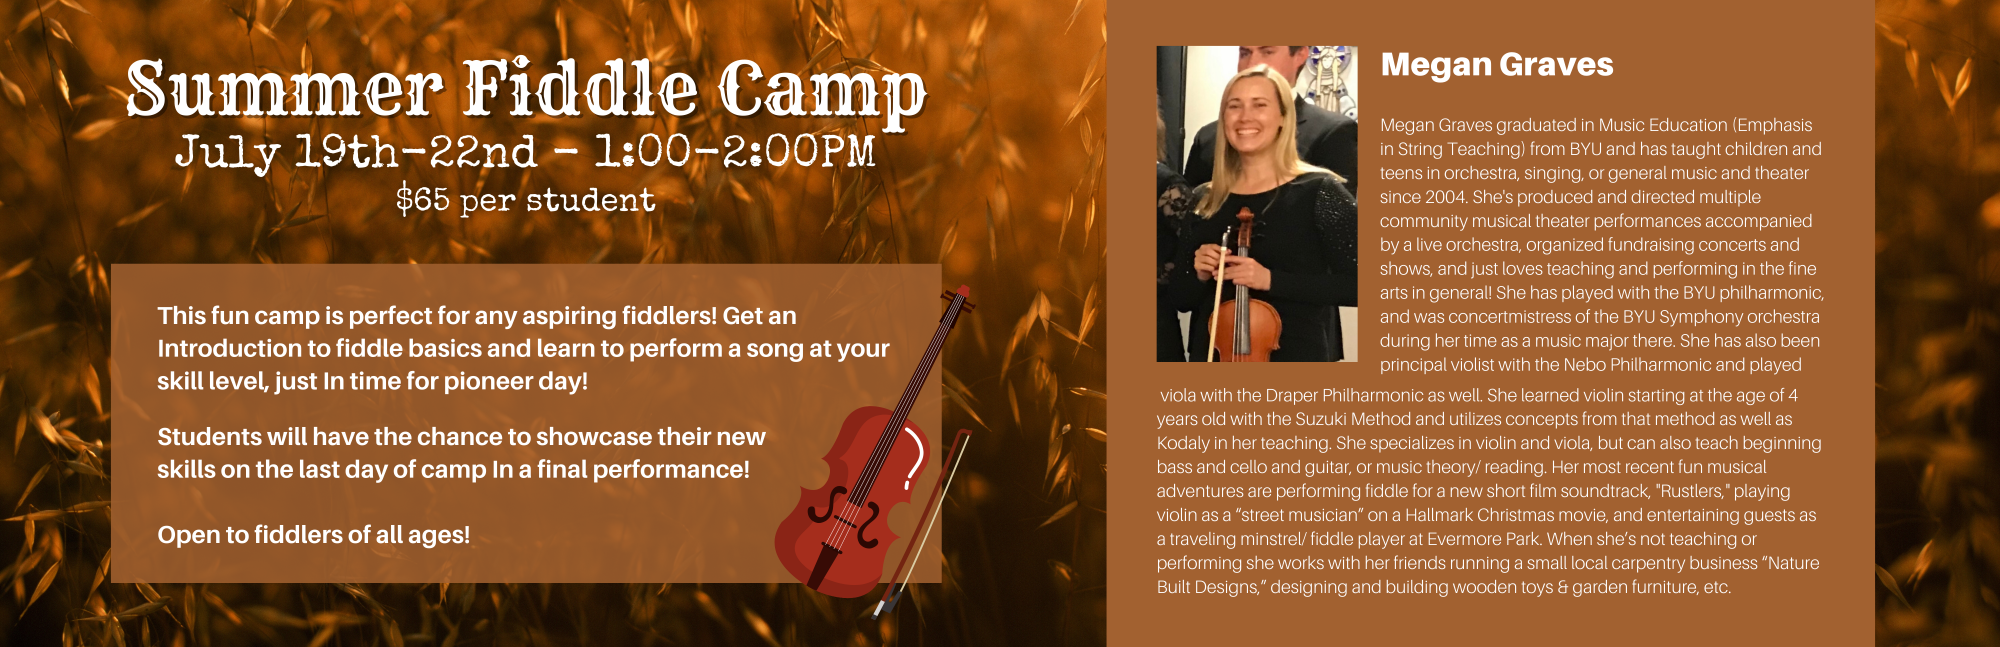 Summer Fiddle Camp